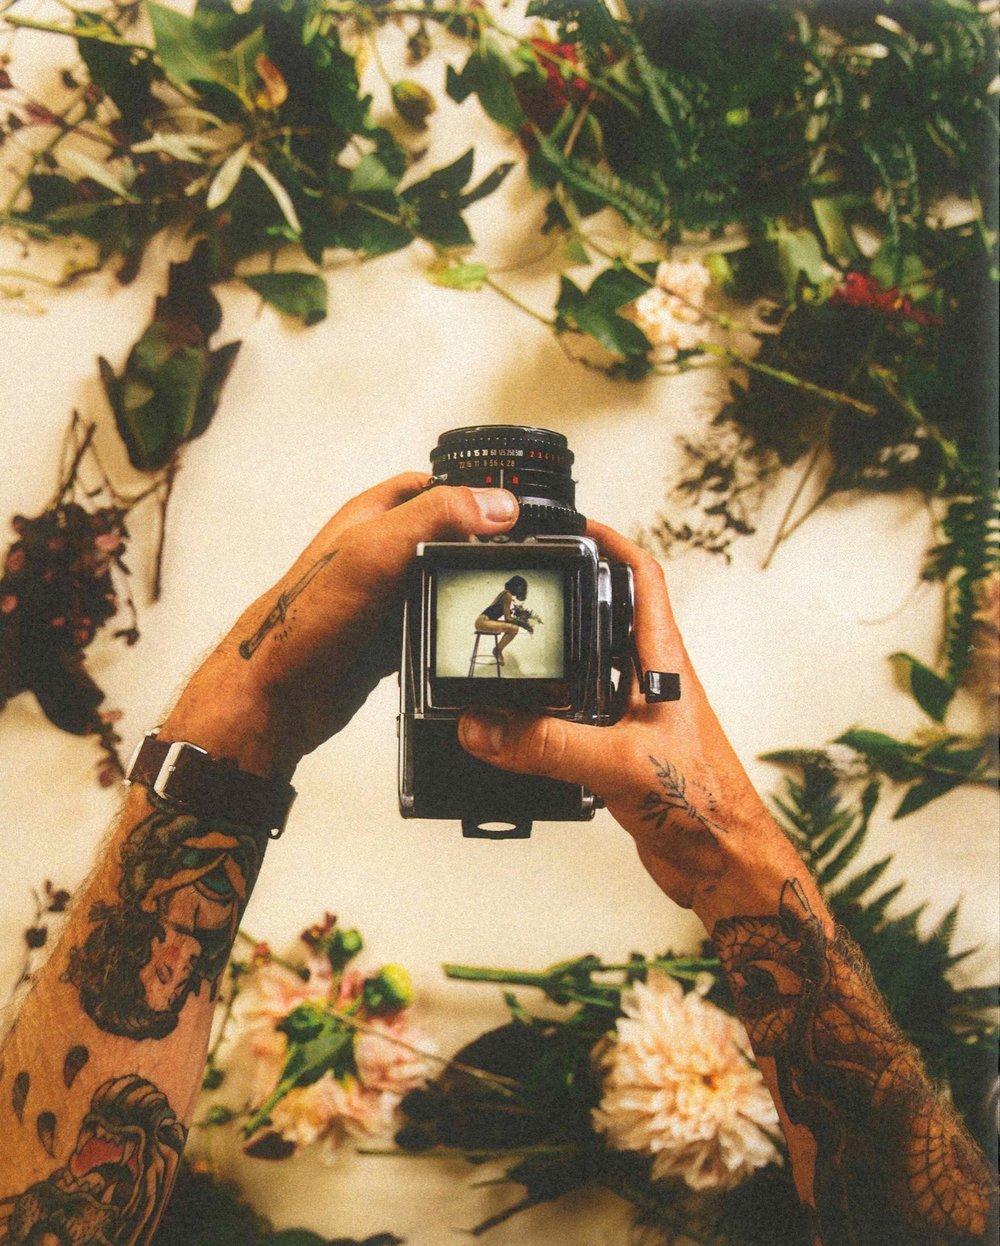 Arturo_Torres_Photographerben-3_web.JPG